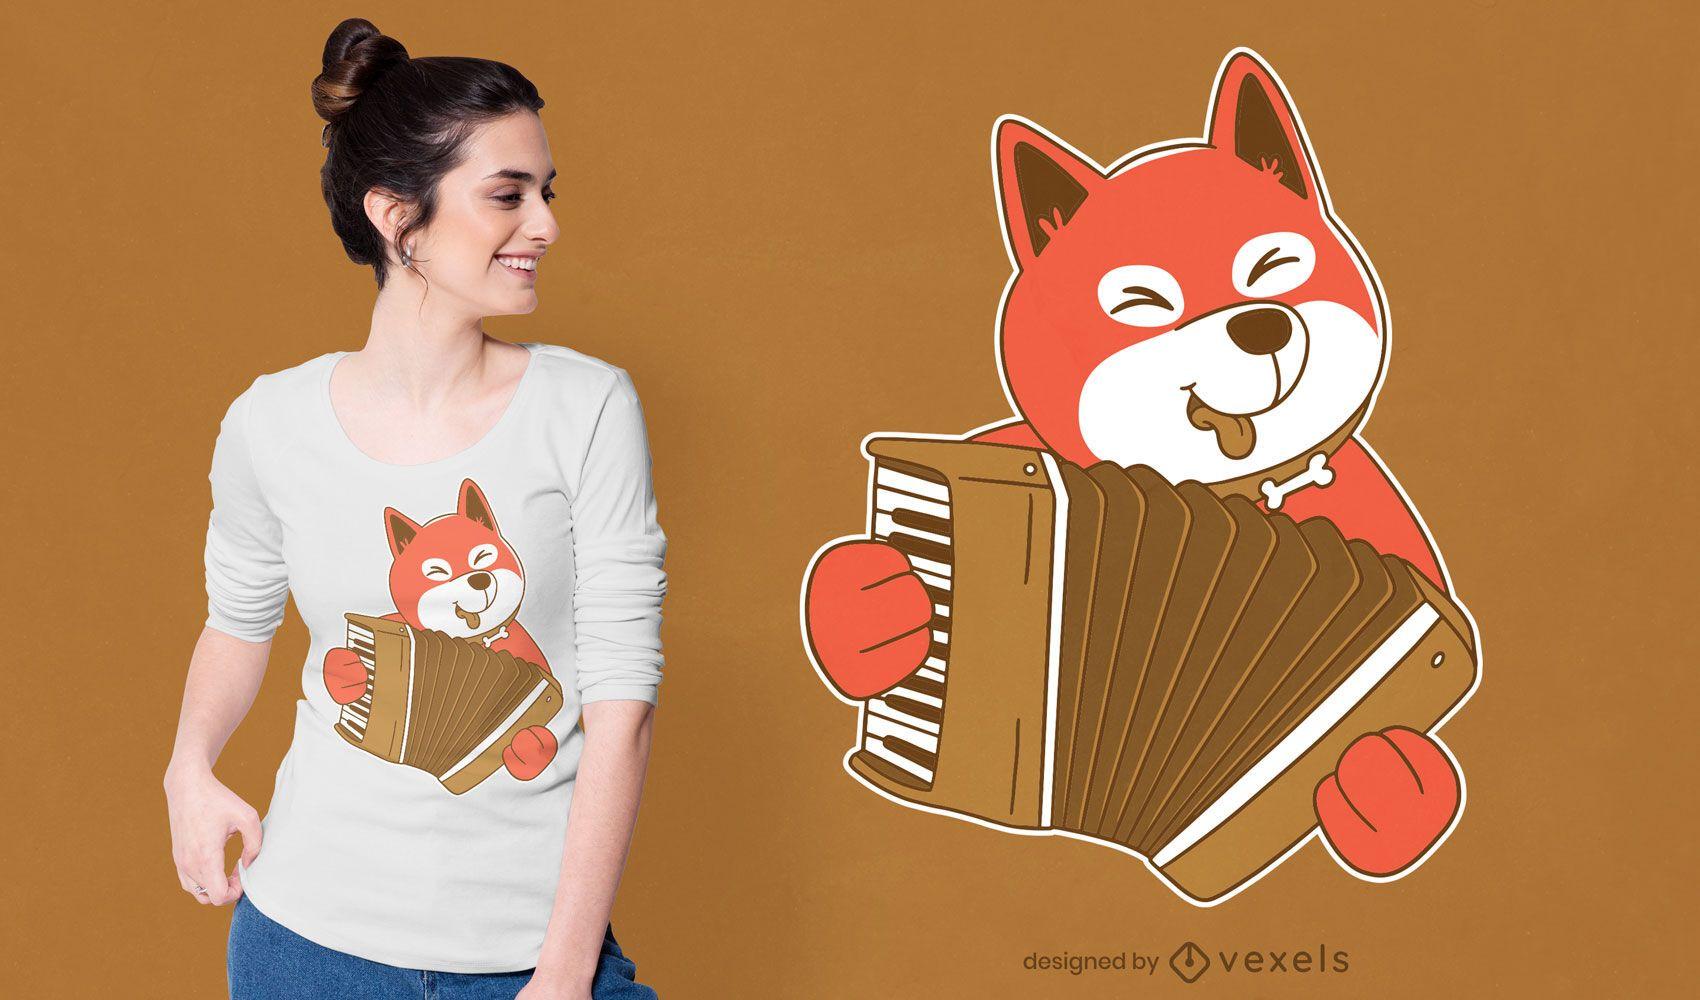 Accordion dog t-shirt design